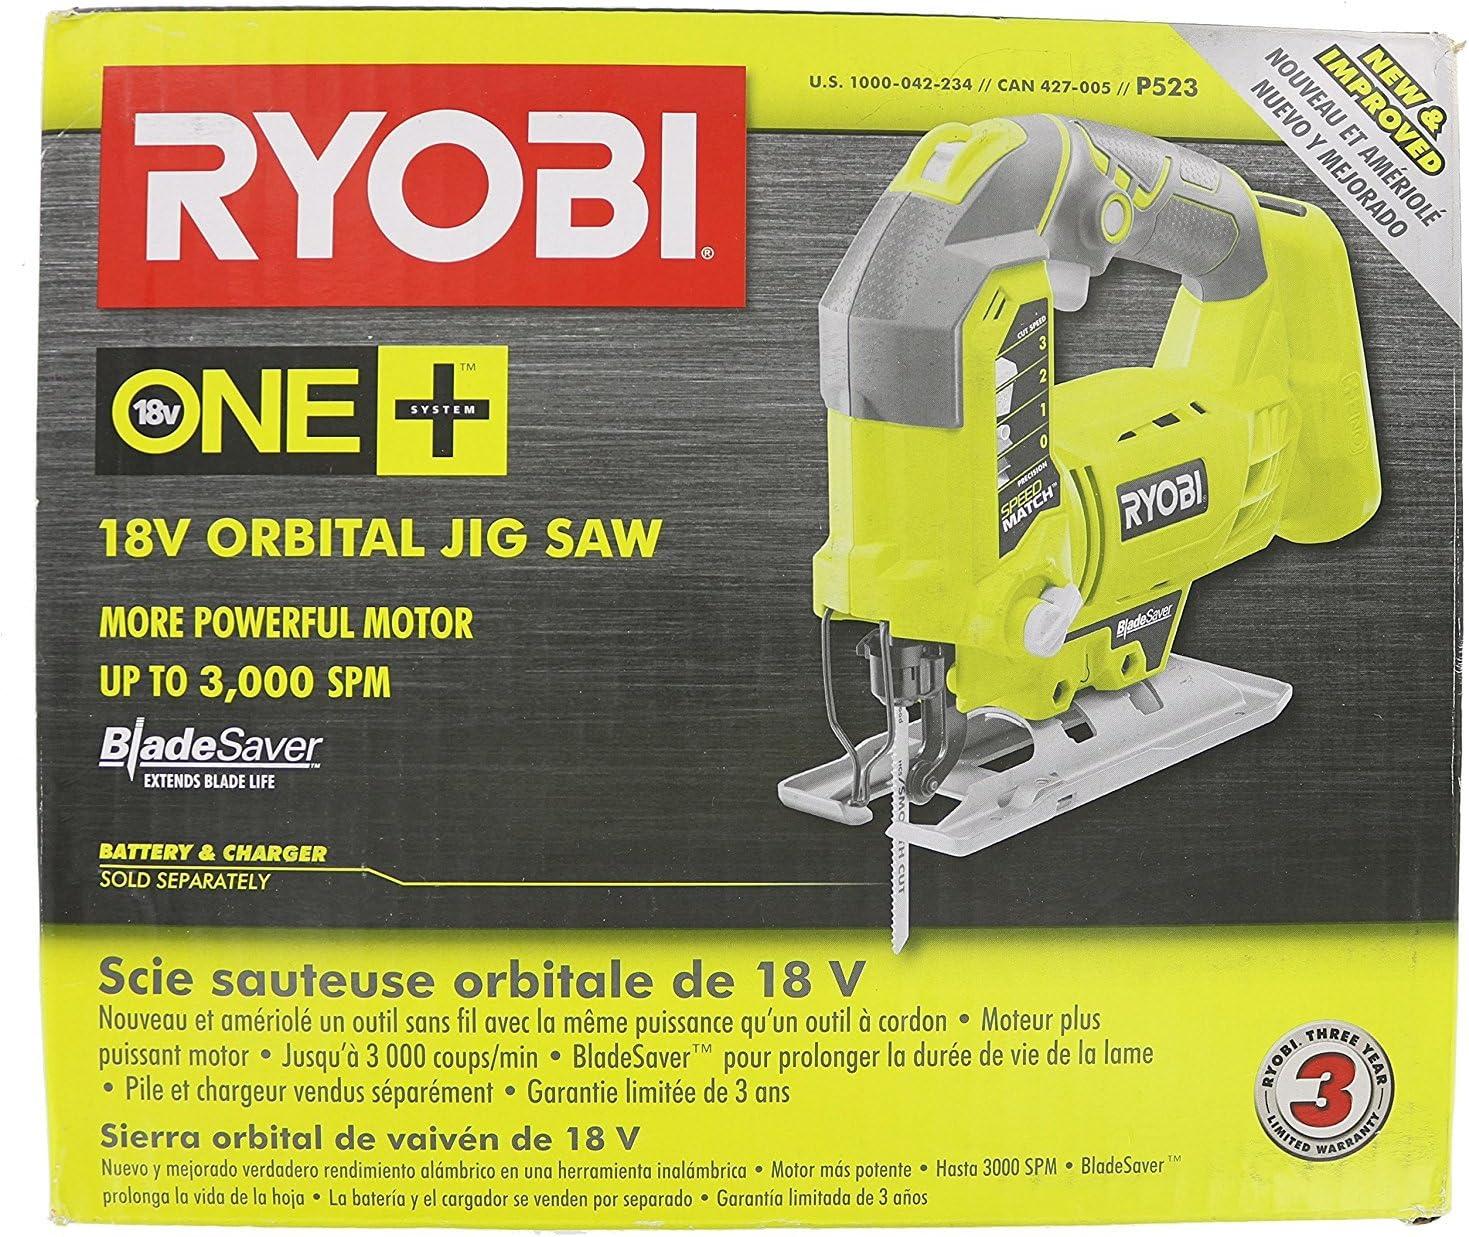 Ryobi One+ P523 Cordless Orbital T-Shaped best Jigsaw